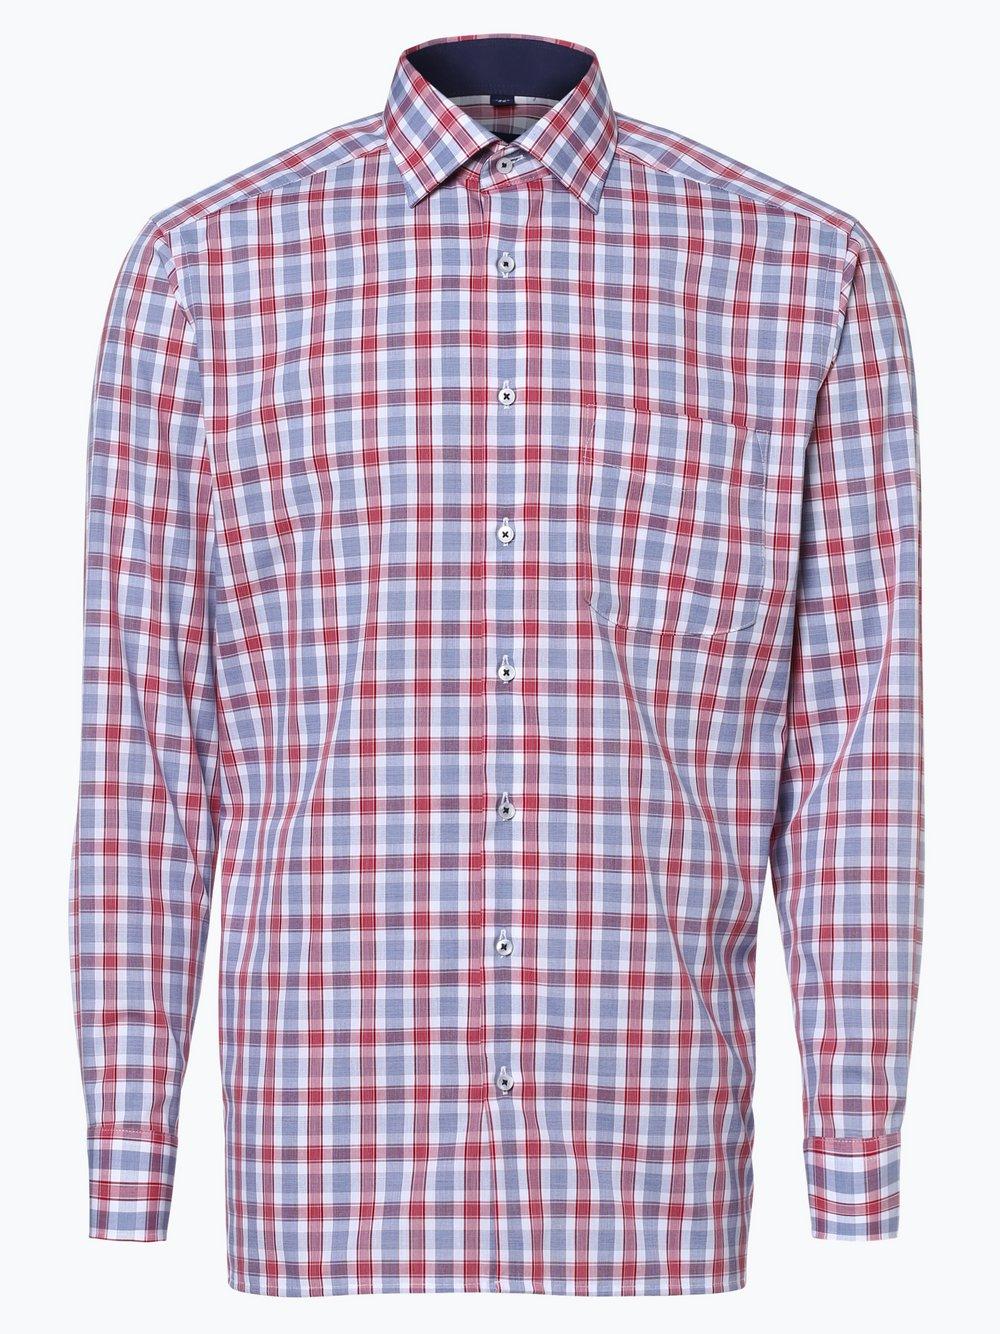 d954030b4e8700 Andrew James Herren Hemd Bügelfrei rot kariert online kaufen | PEEK ...